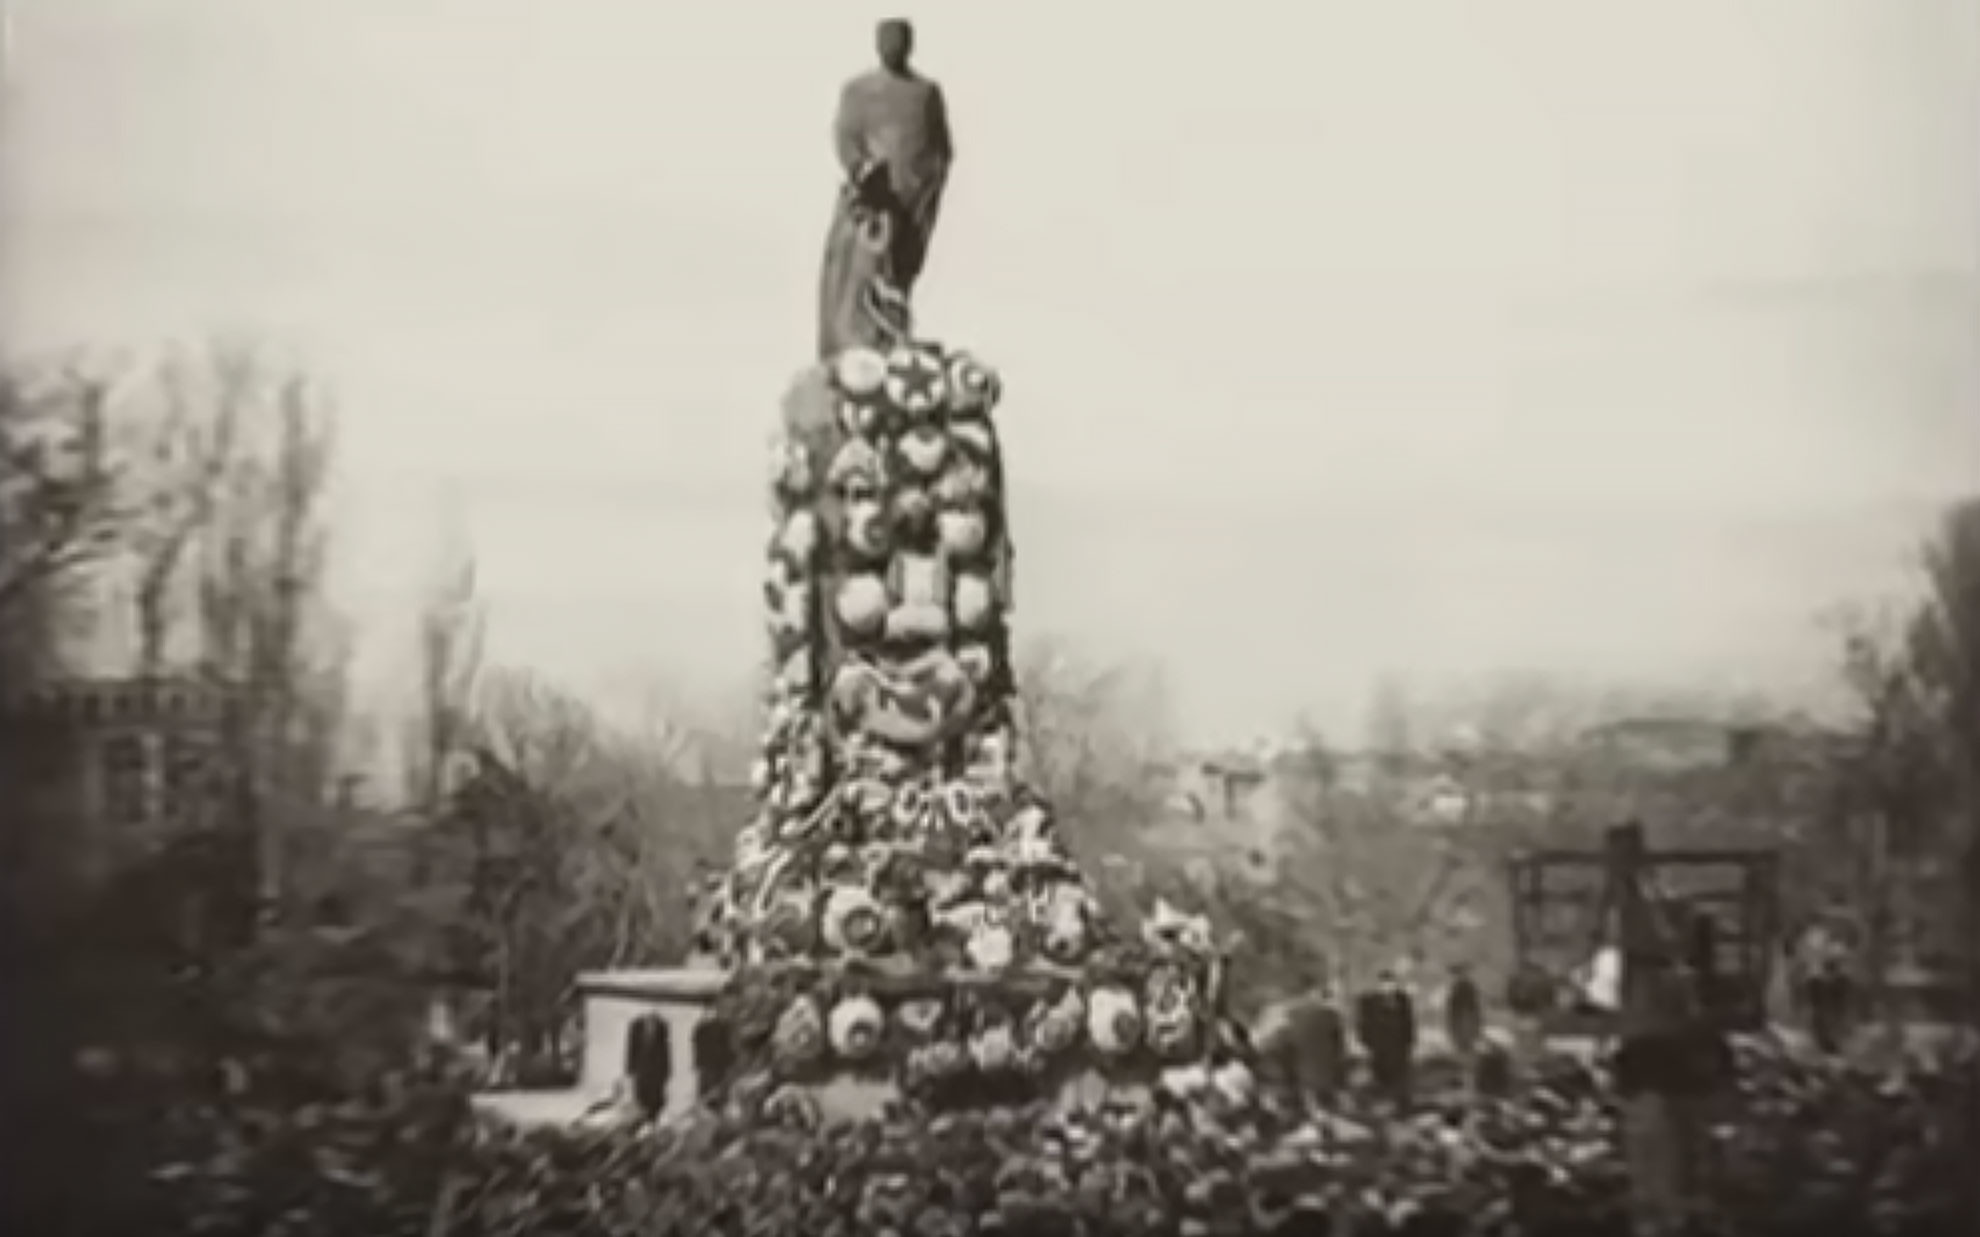 Памятник Сталину в Тбилиси, 1956 год. Фото: © кадр из видео YouTube/канал AtamanA